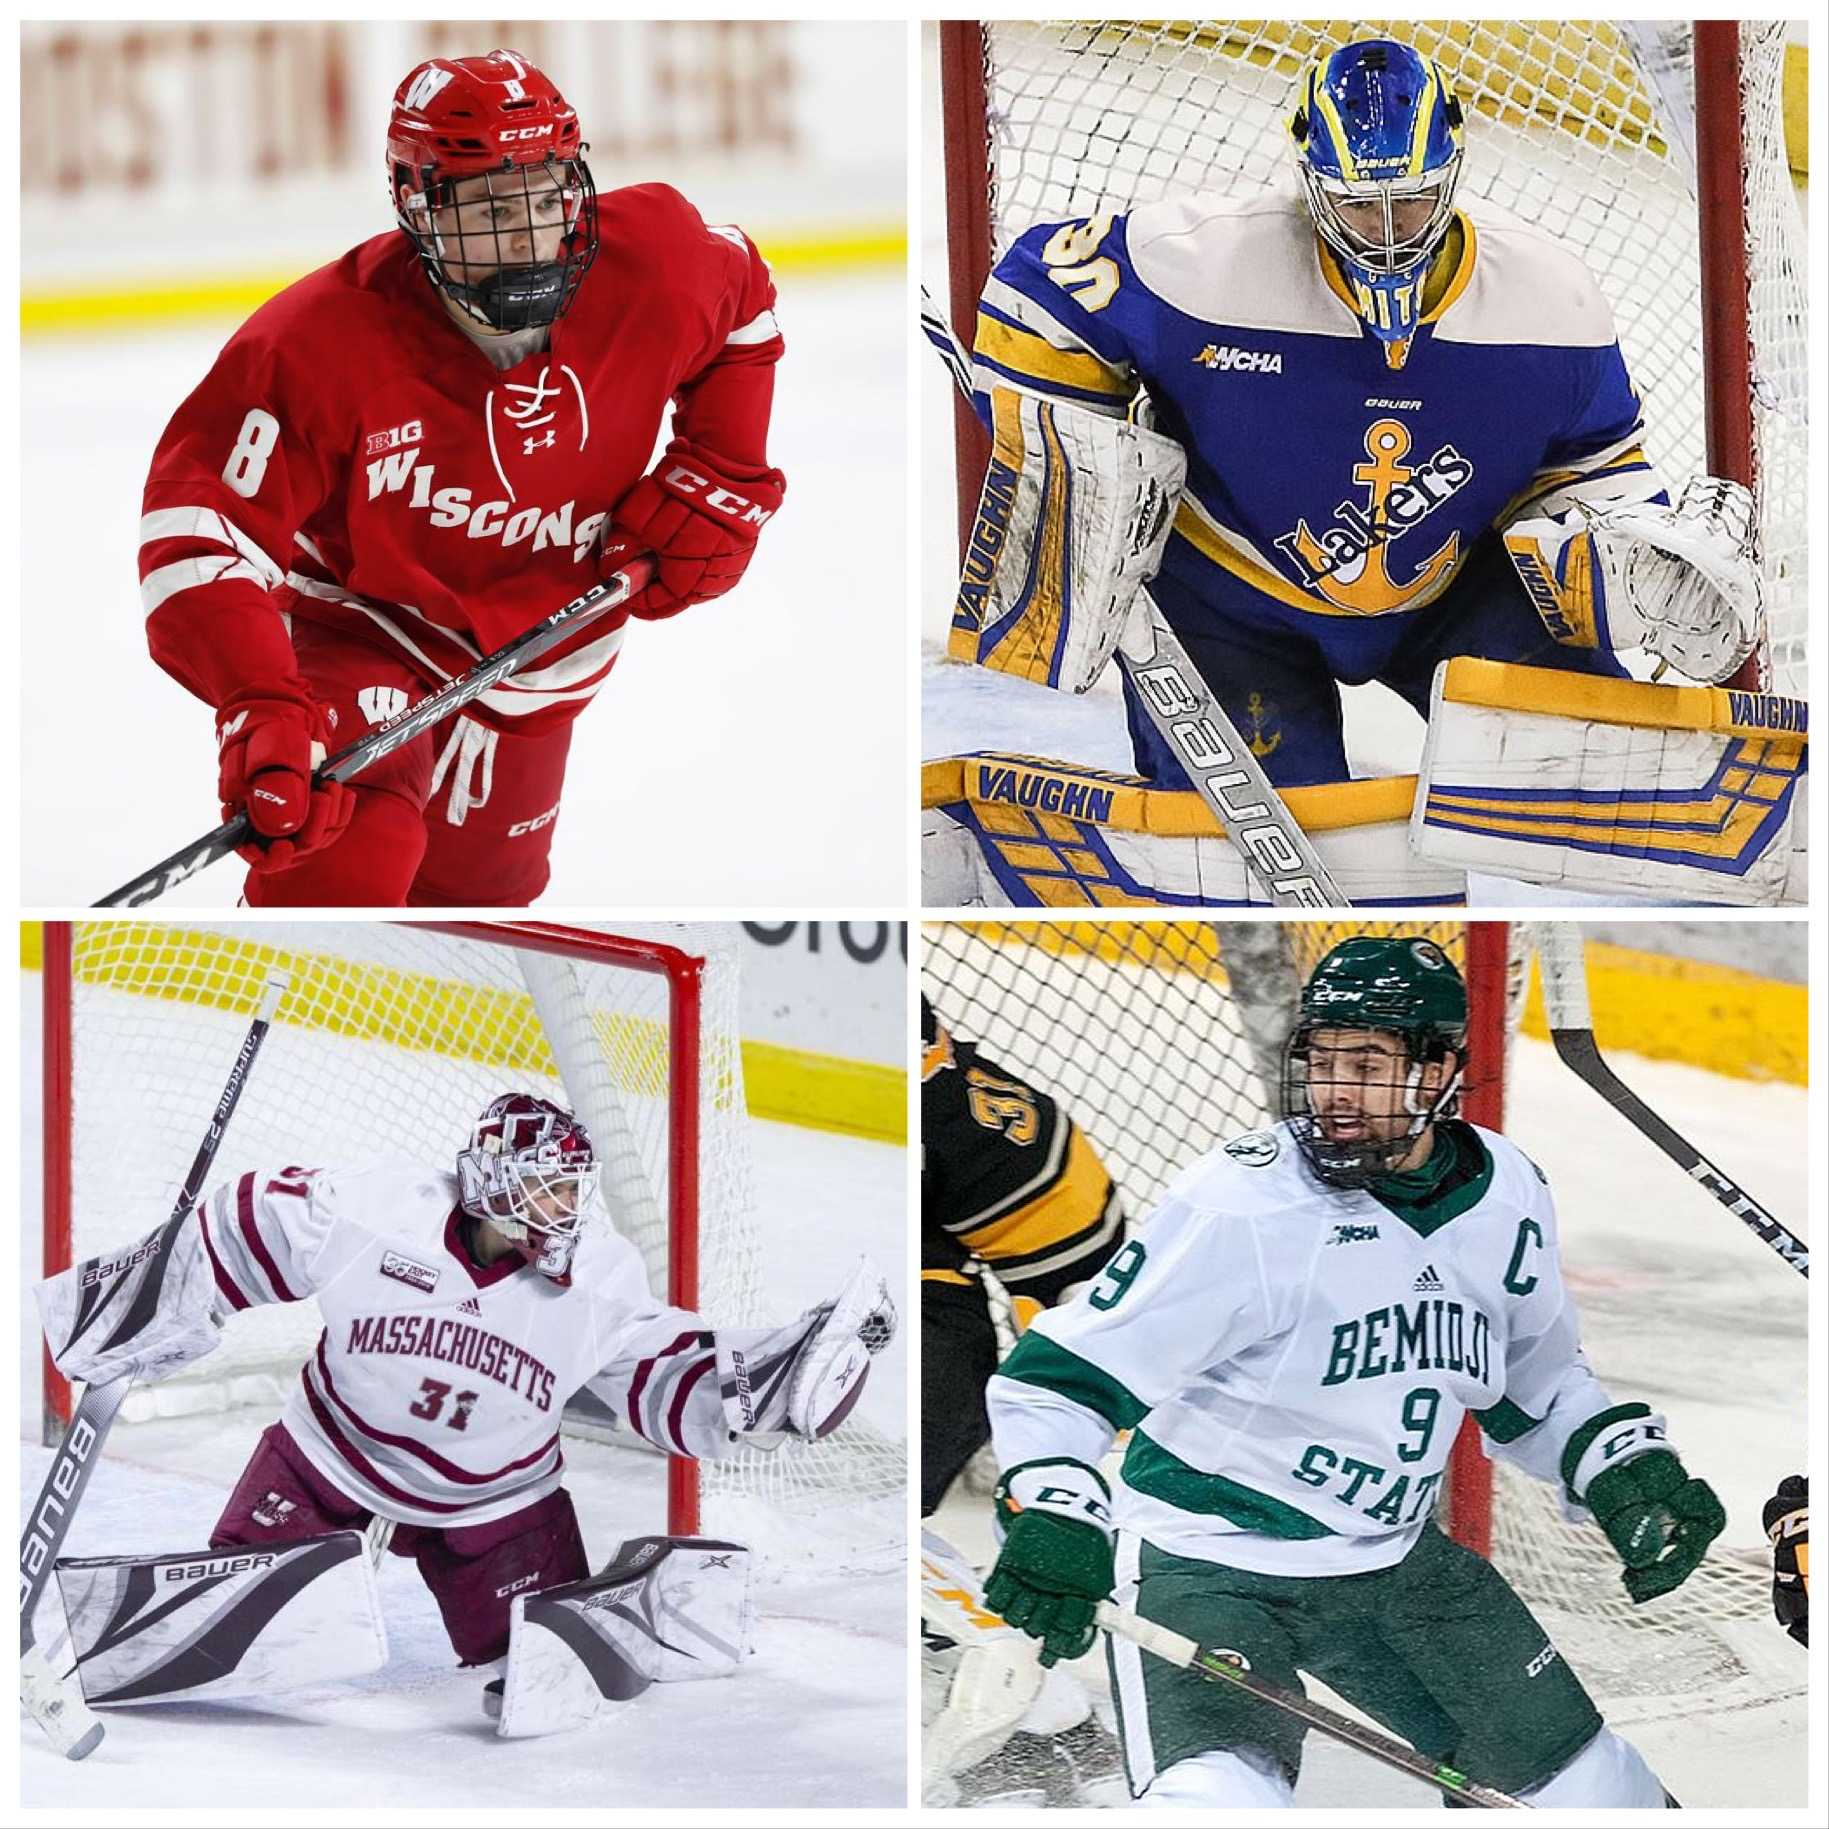 NCAA Frozen Four Tournament: Bridgeport Regional